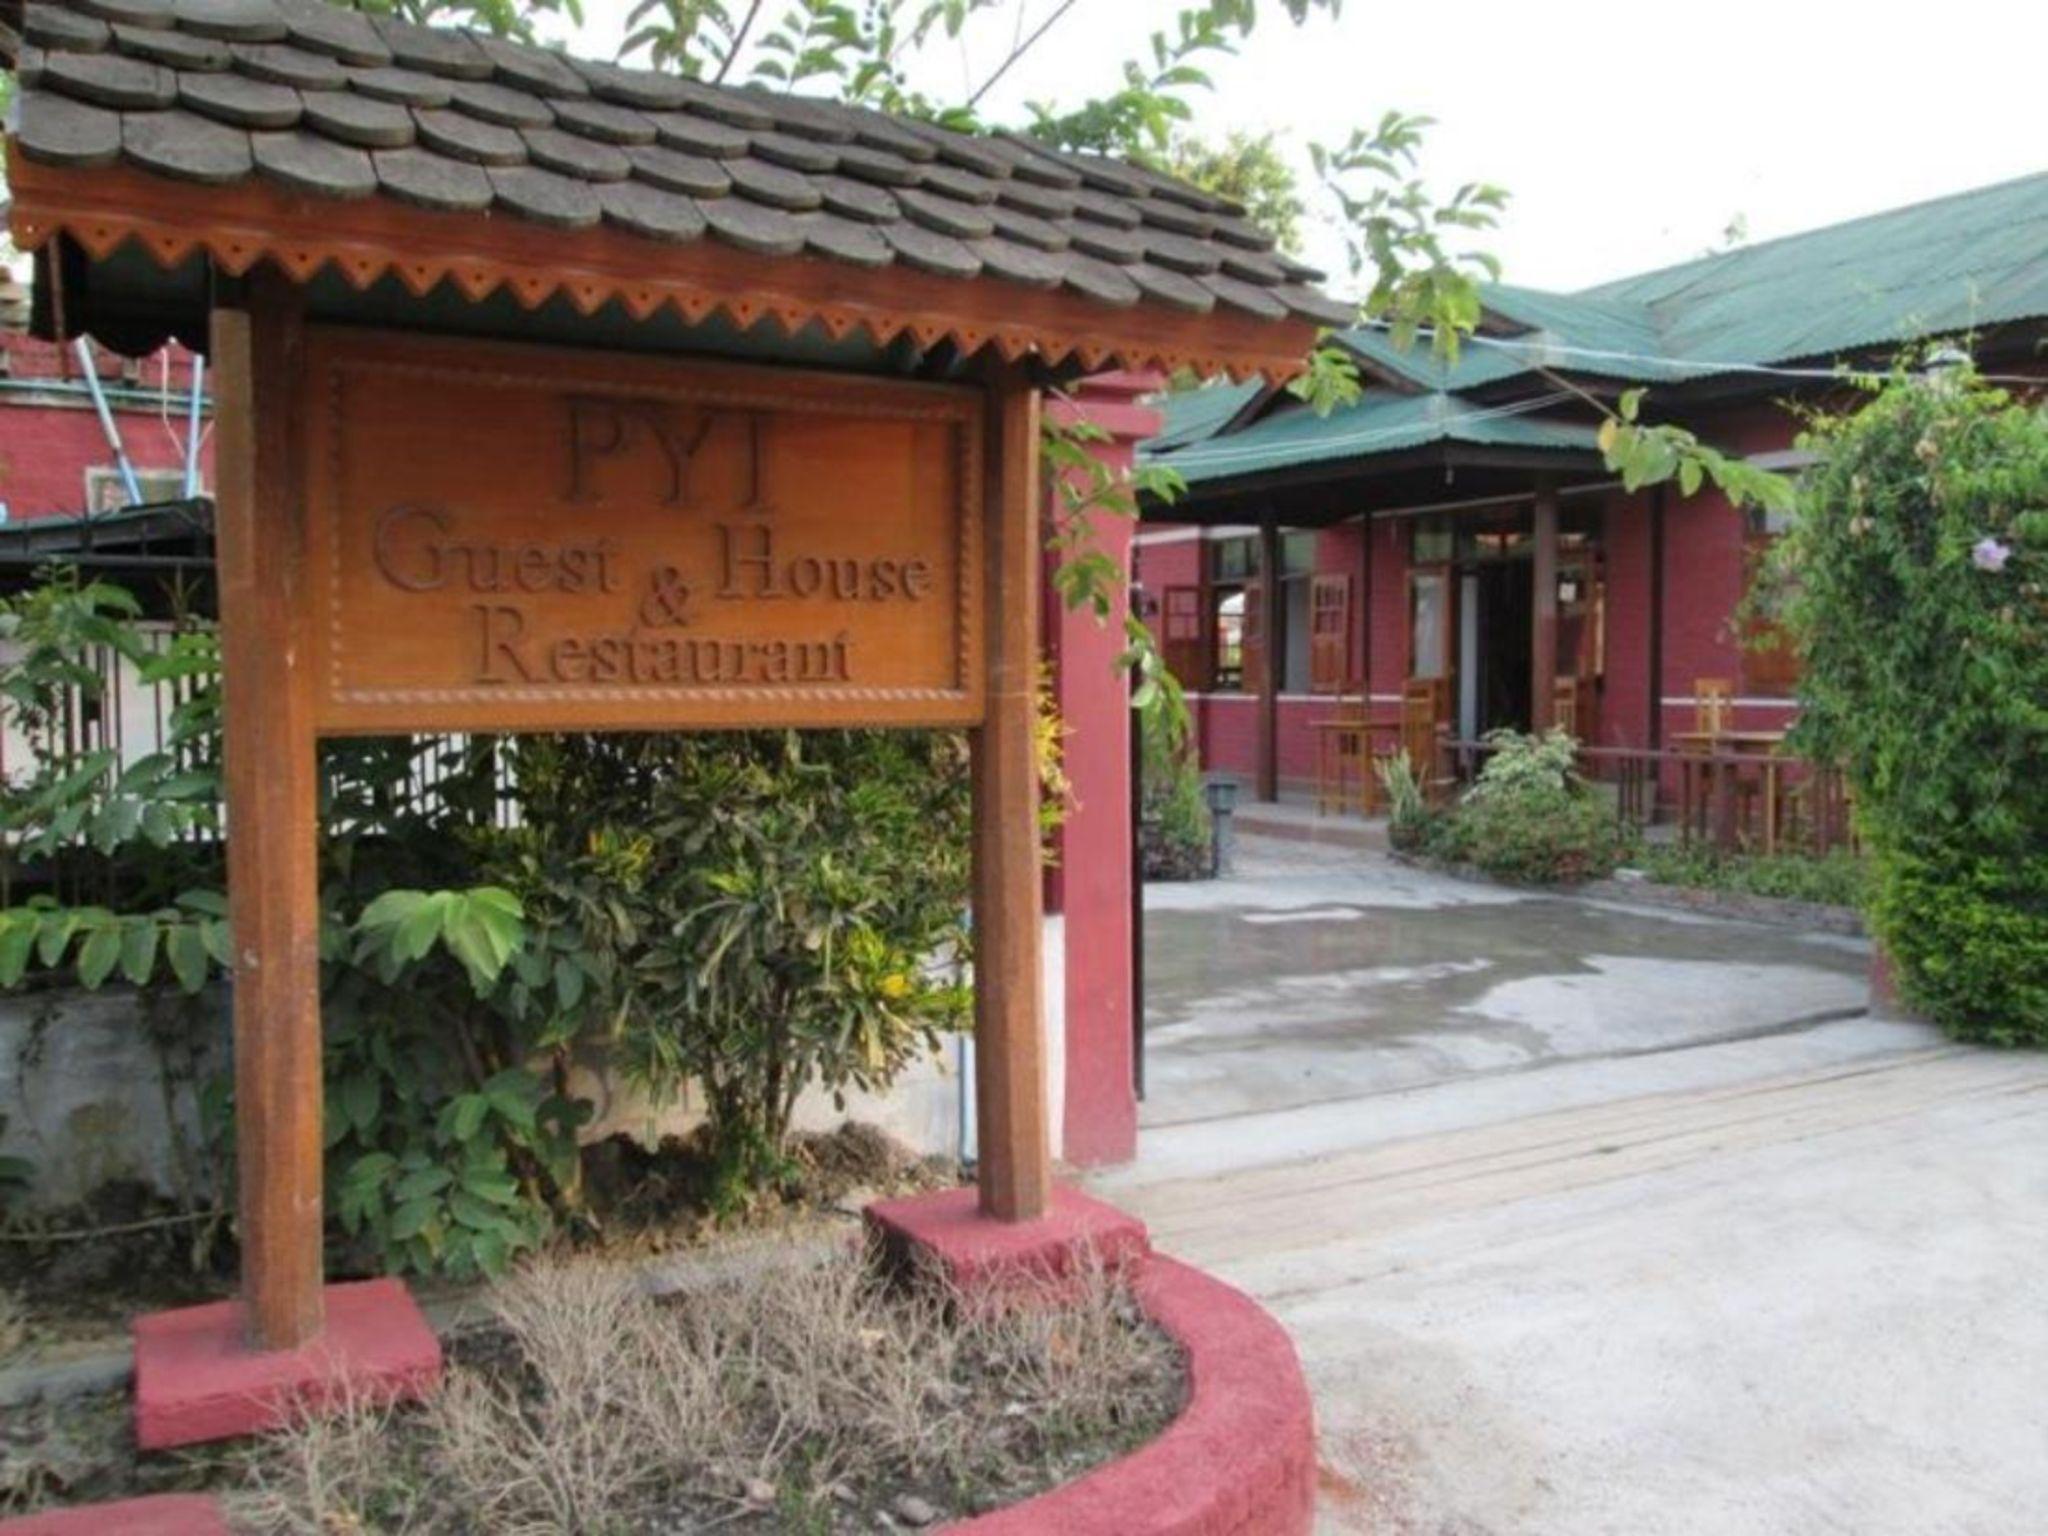 Pyi Guest House, Taunggye